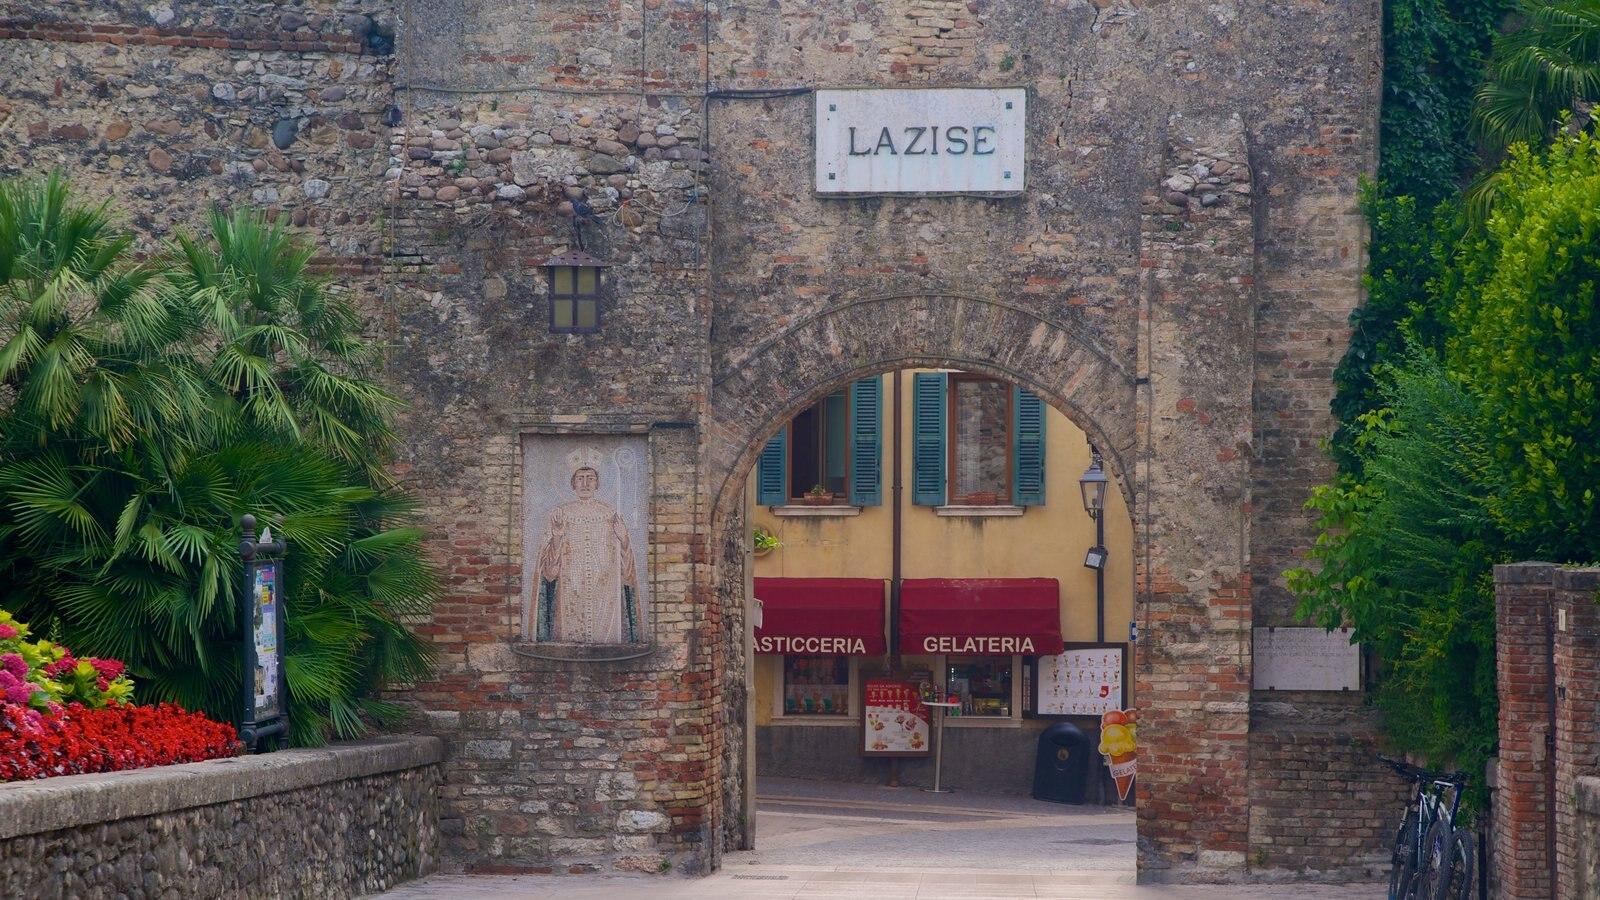 Lazise showing heritage architecture